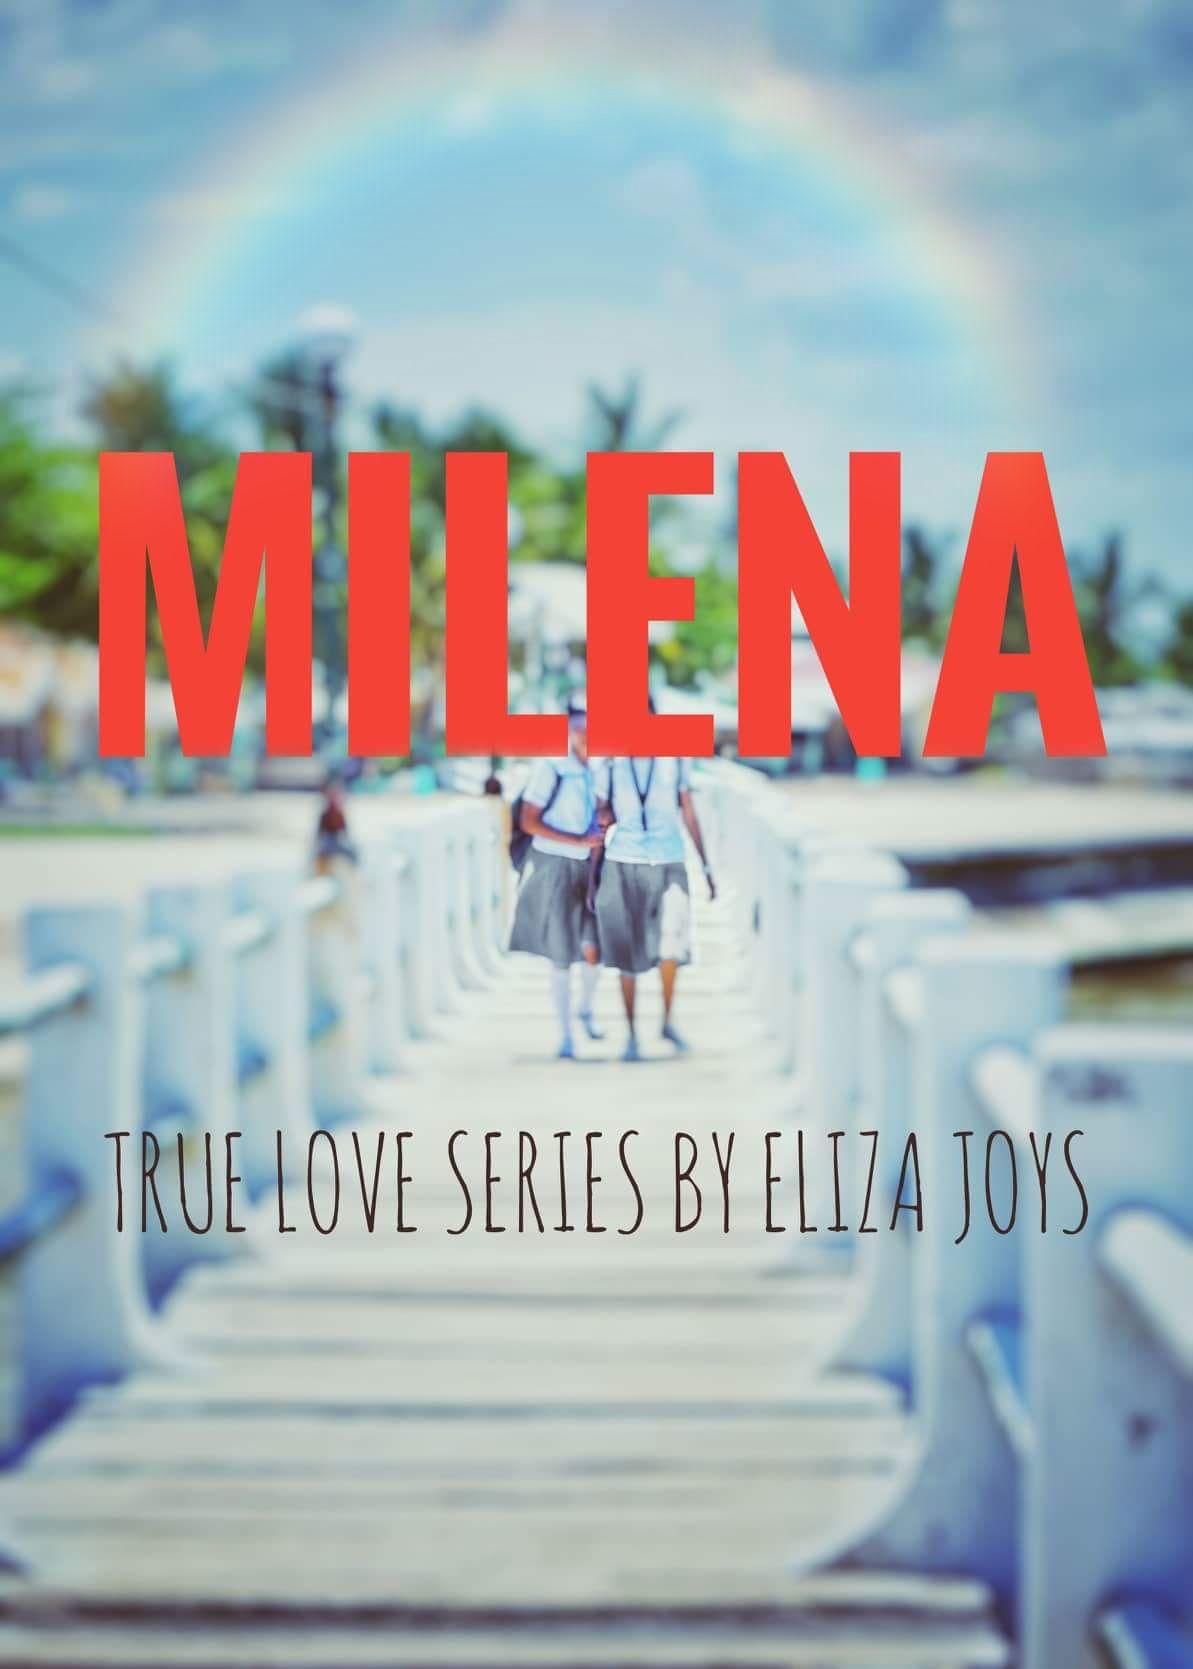 Milena (gxg)